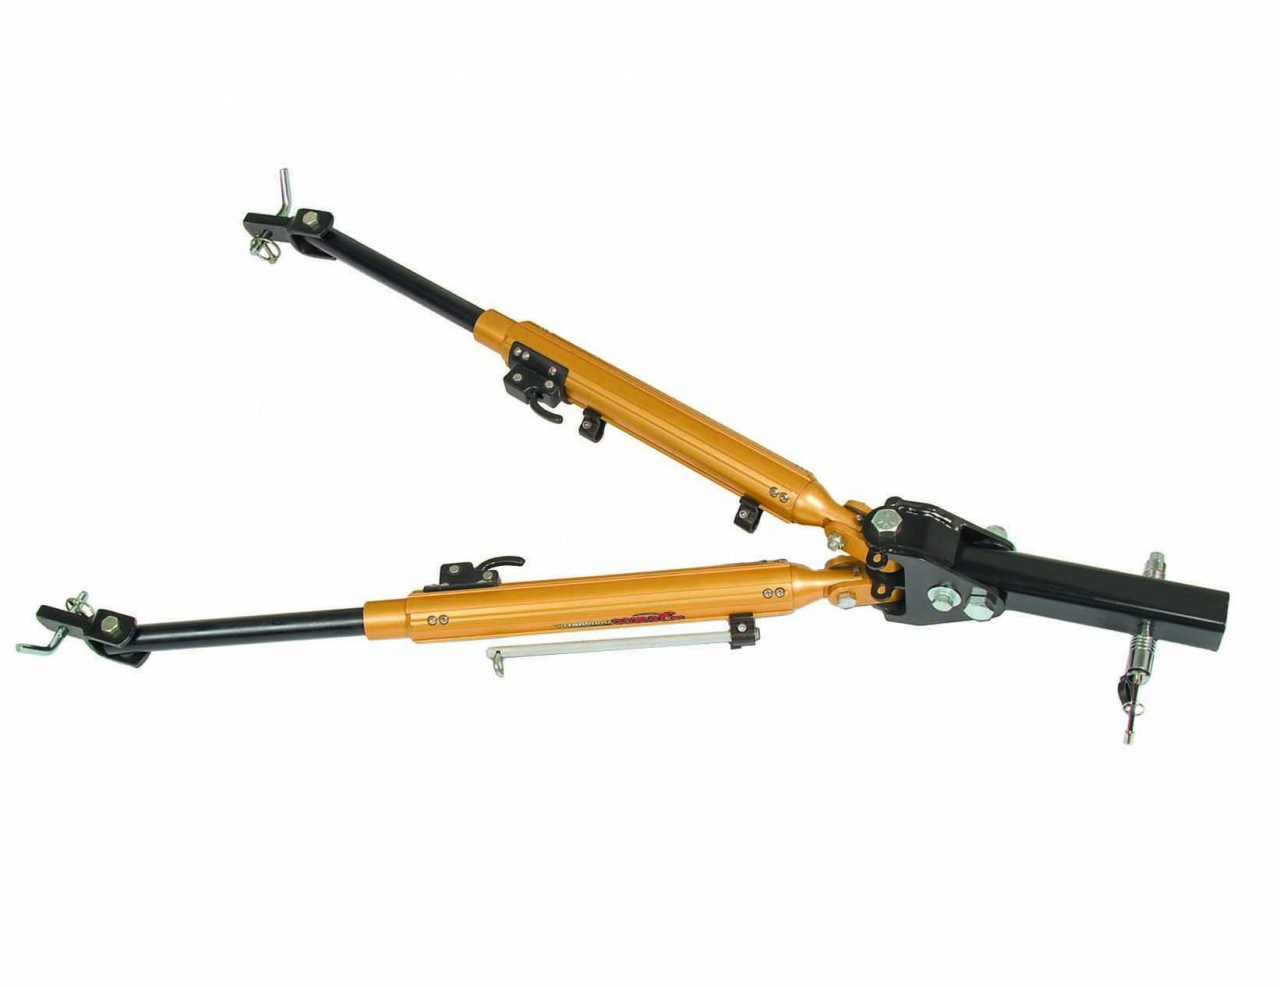 9511008 --- Demco Dominator® 7,500 lb Capacity Tow Bar